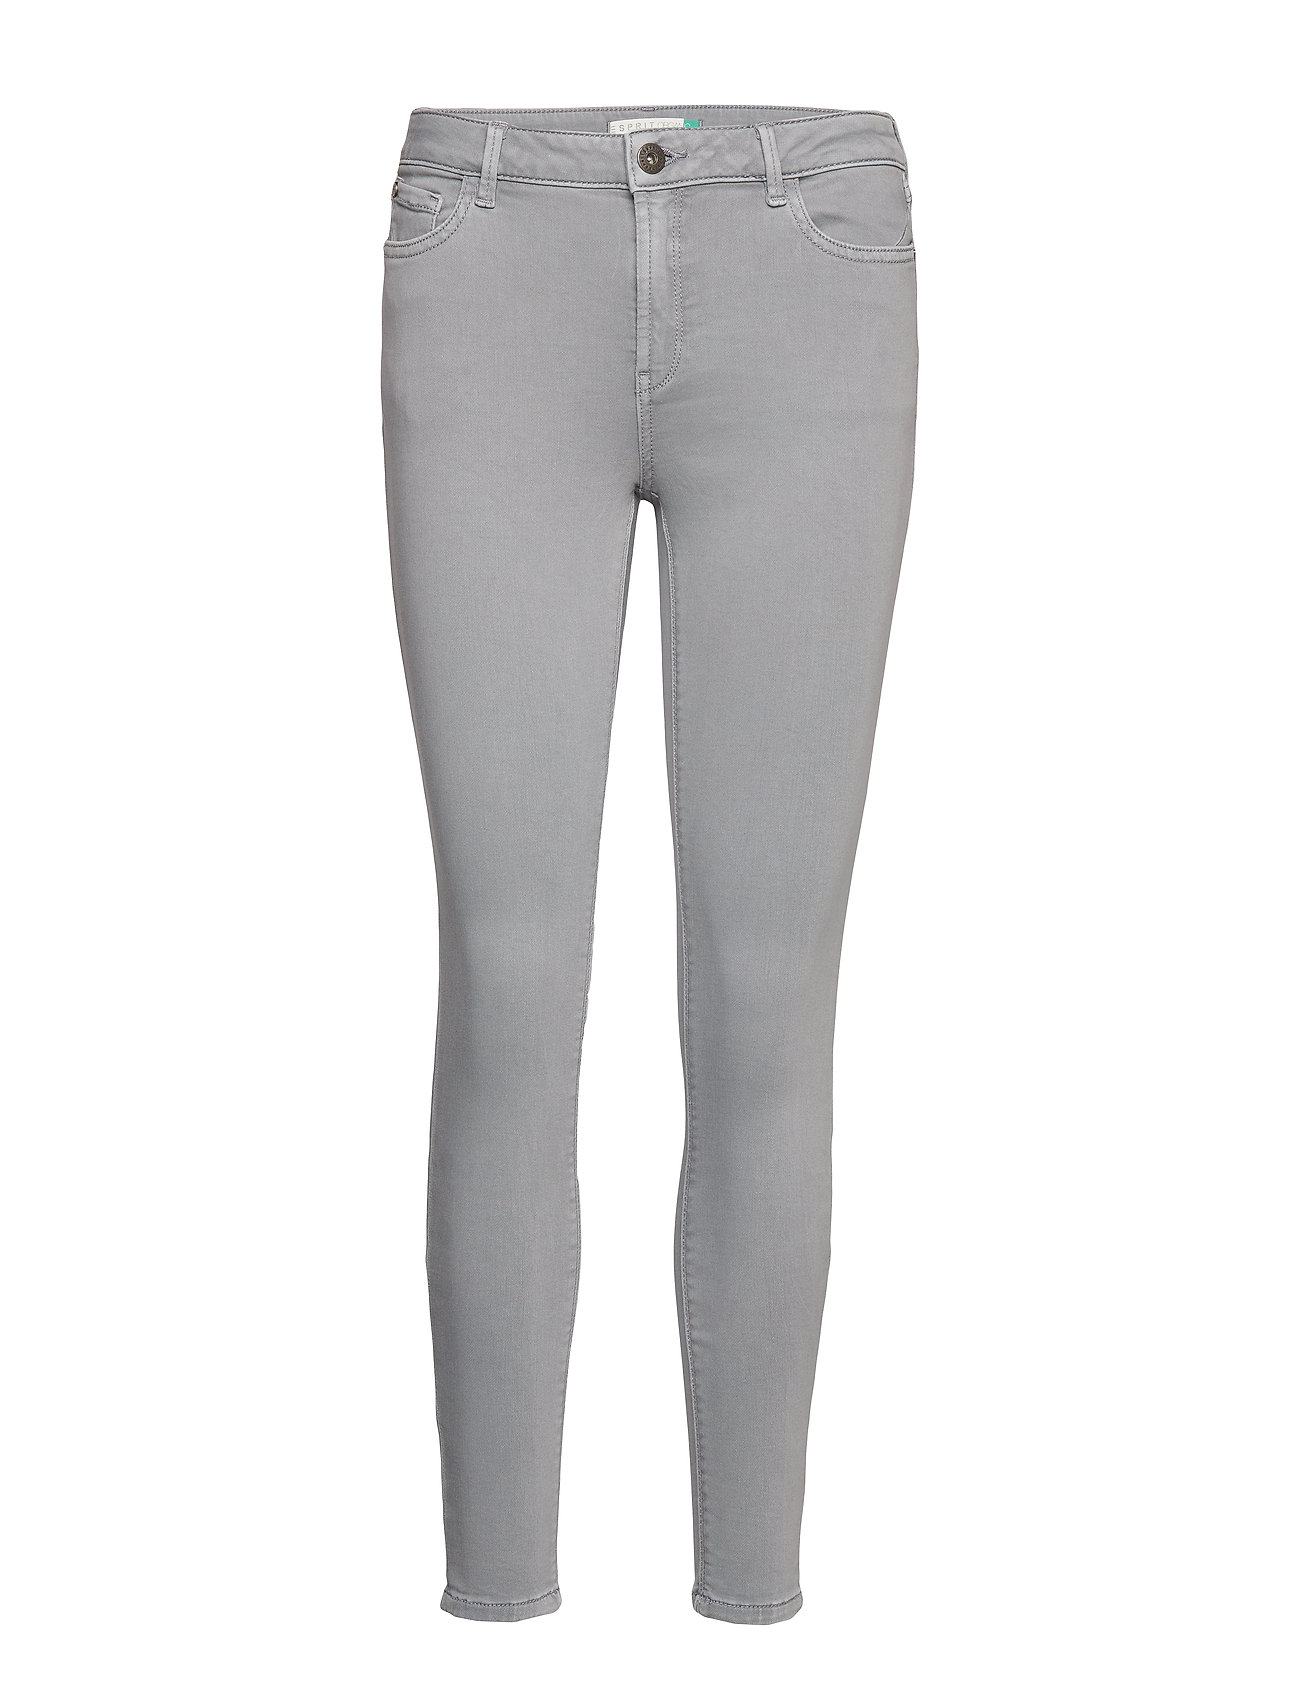 Esprit Casual Pants woven - GREY BLUE